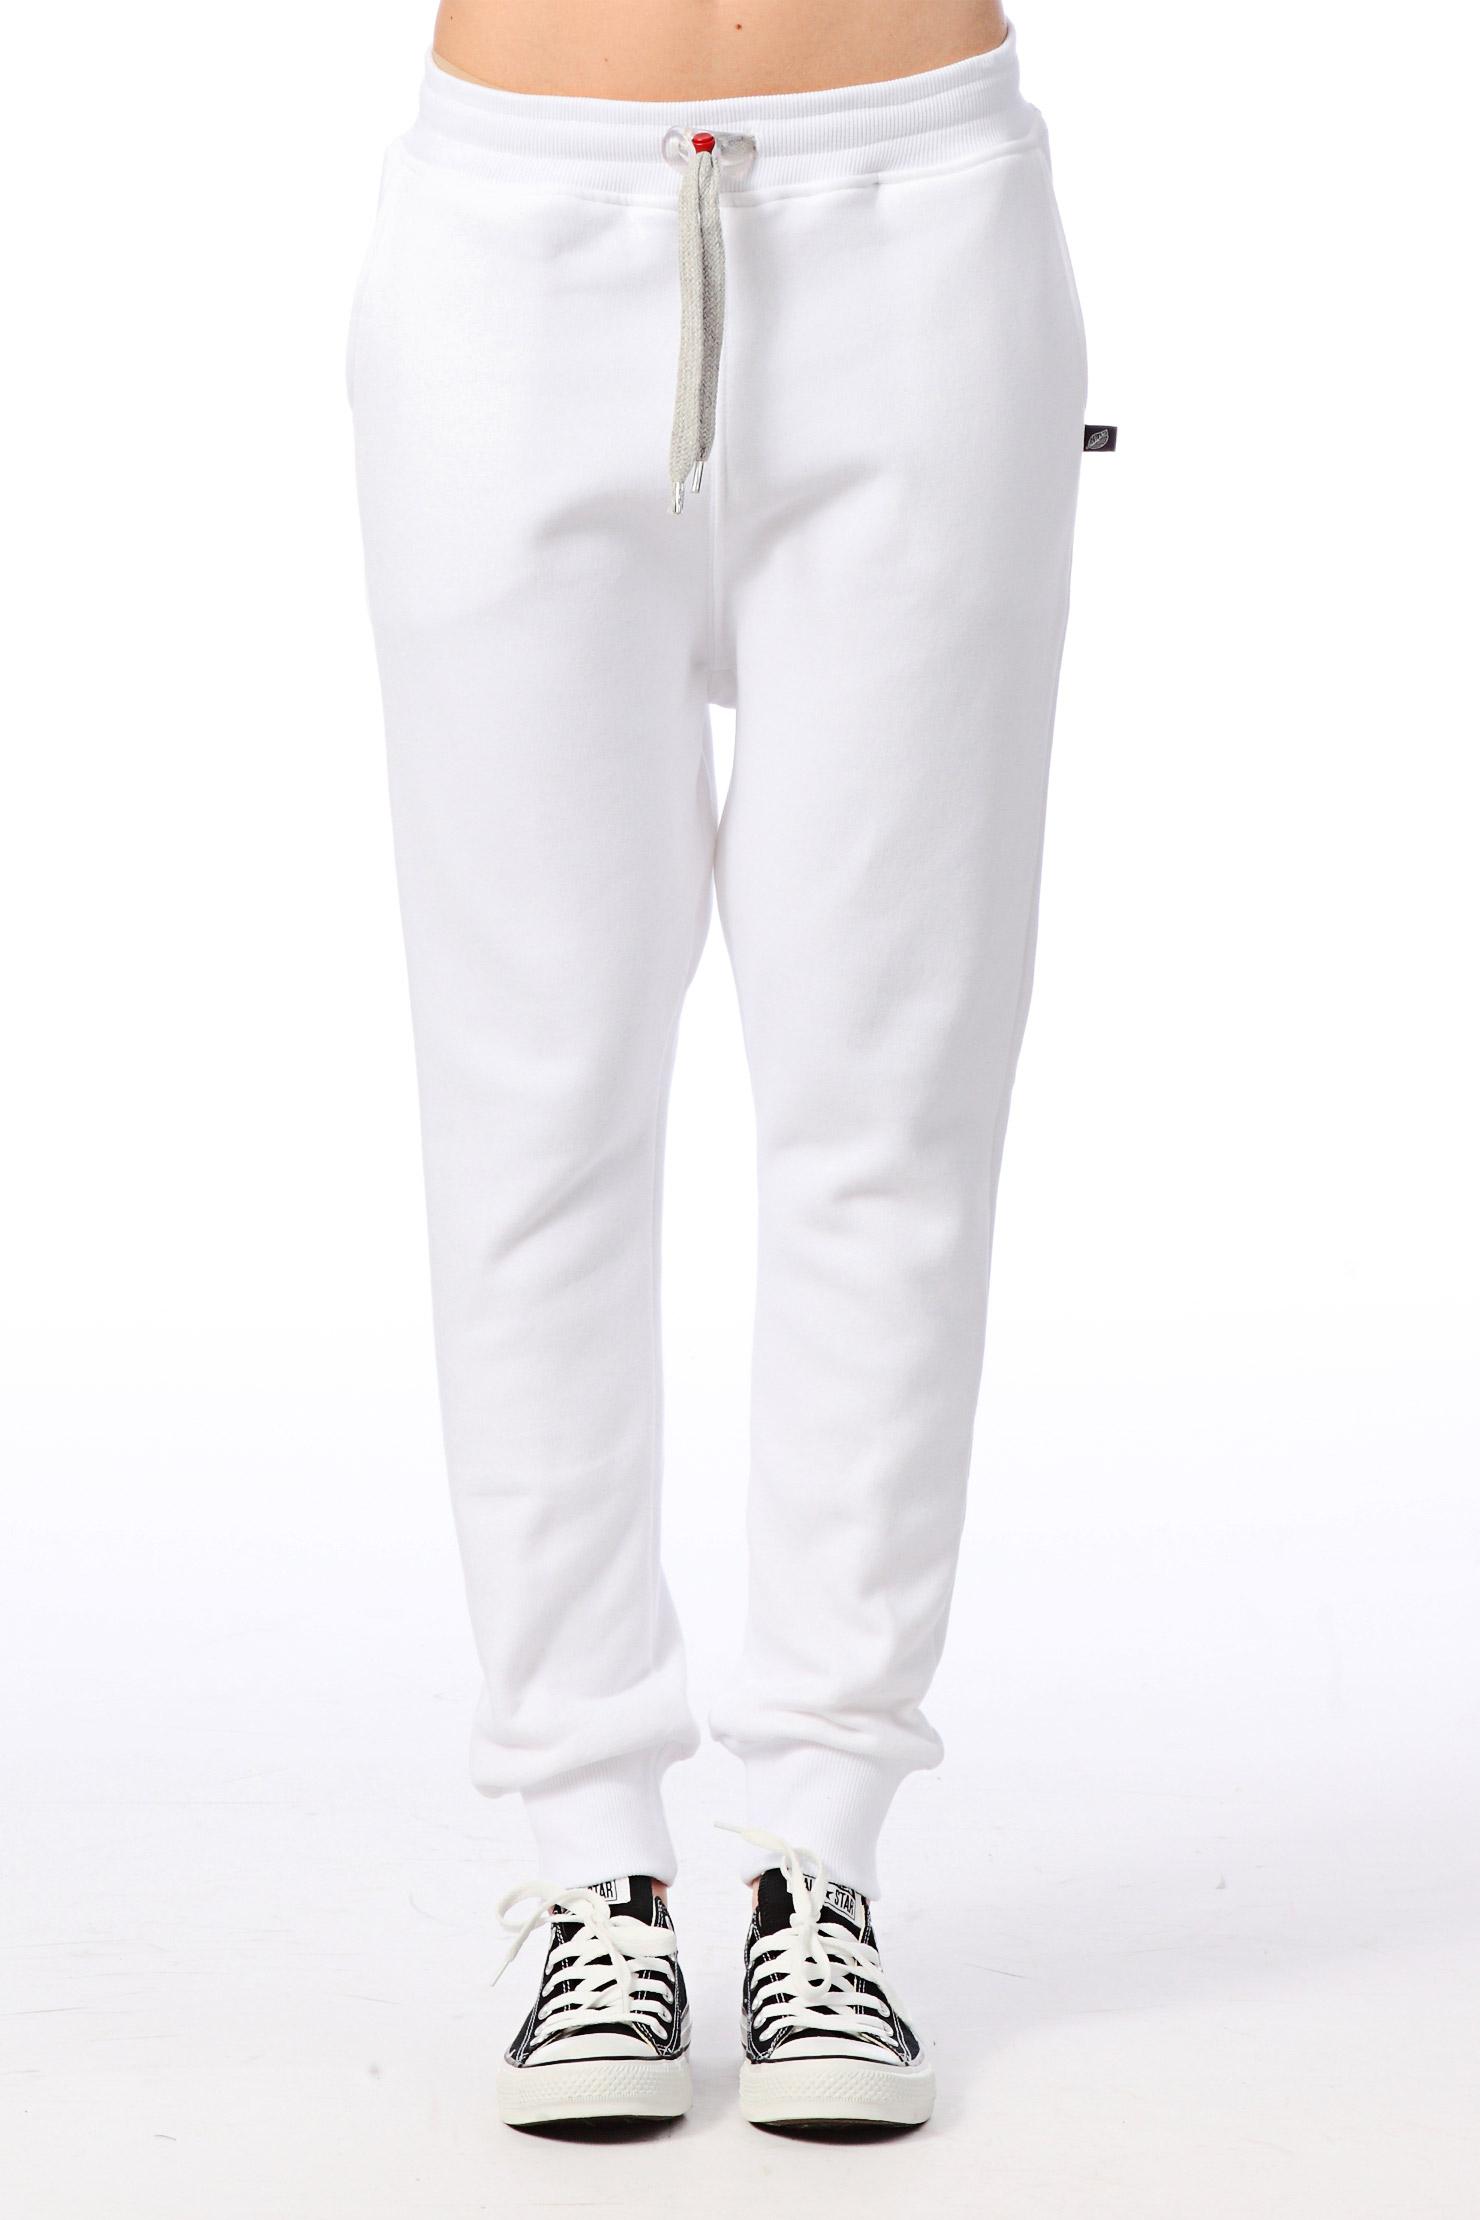 White Sport Pants | Pant So